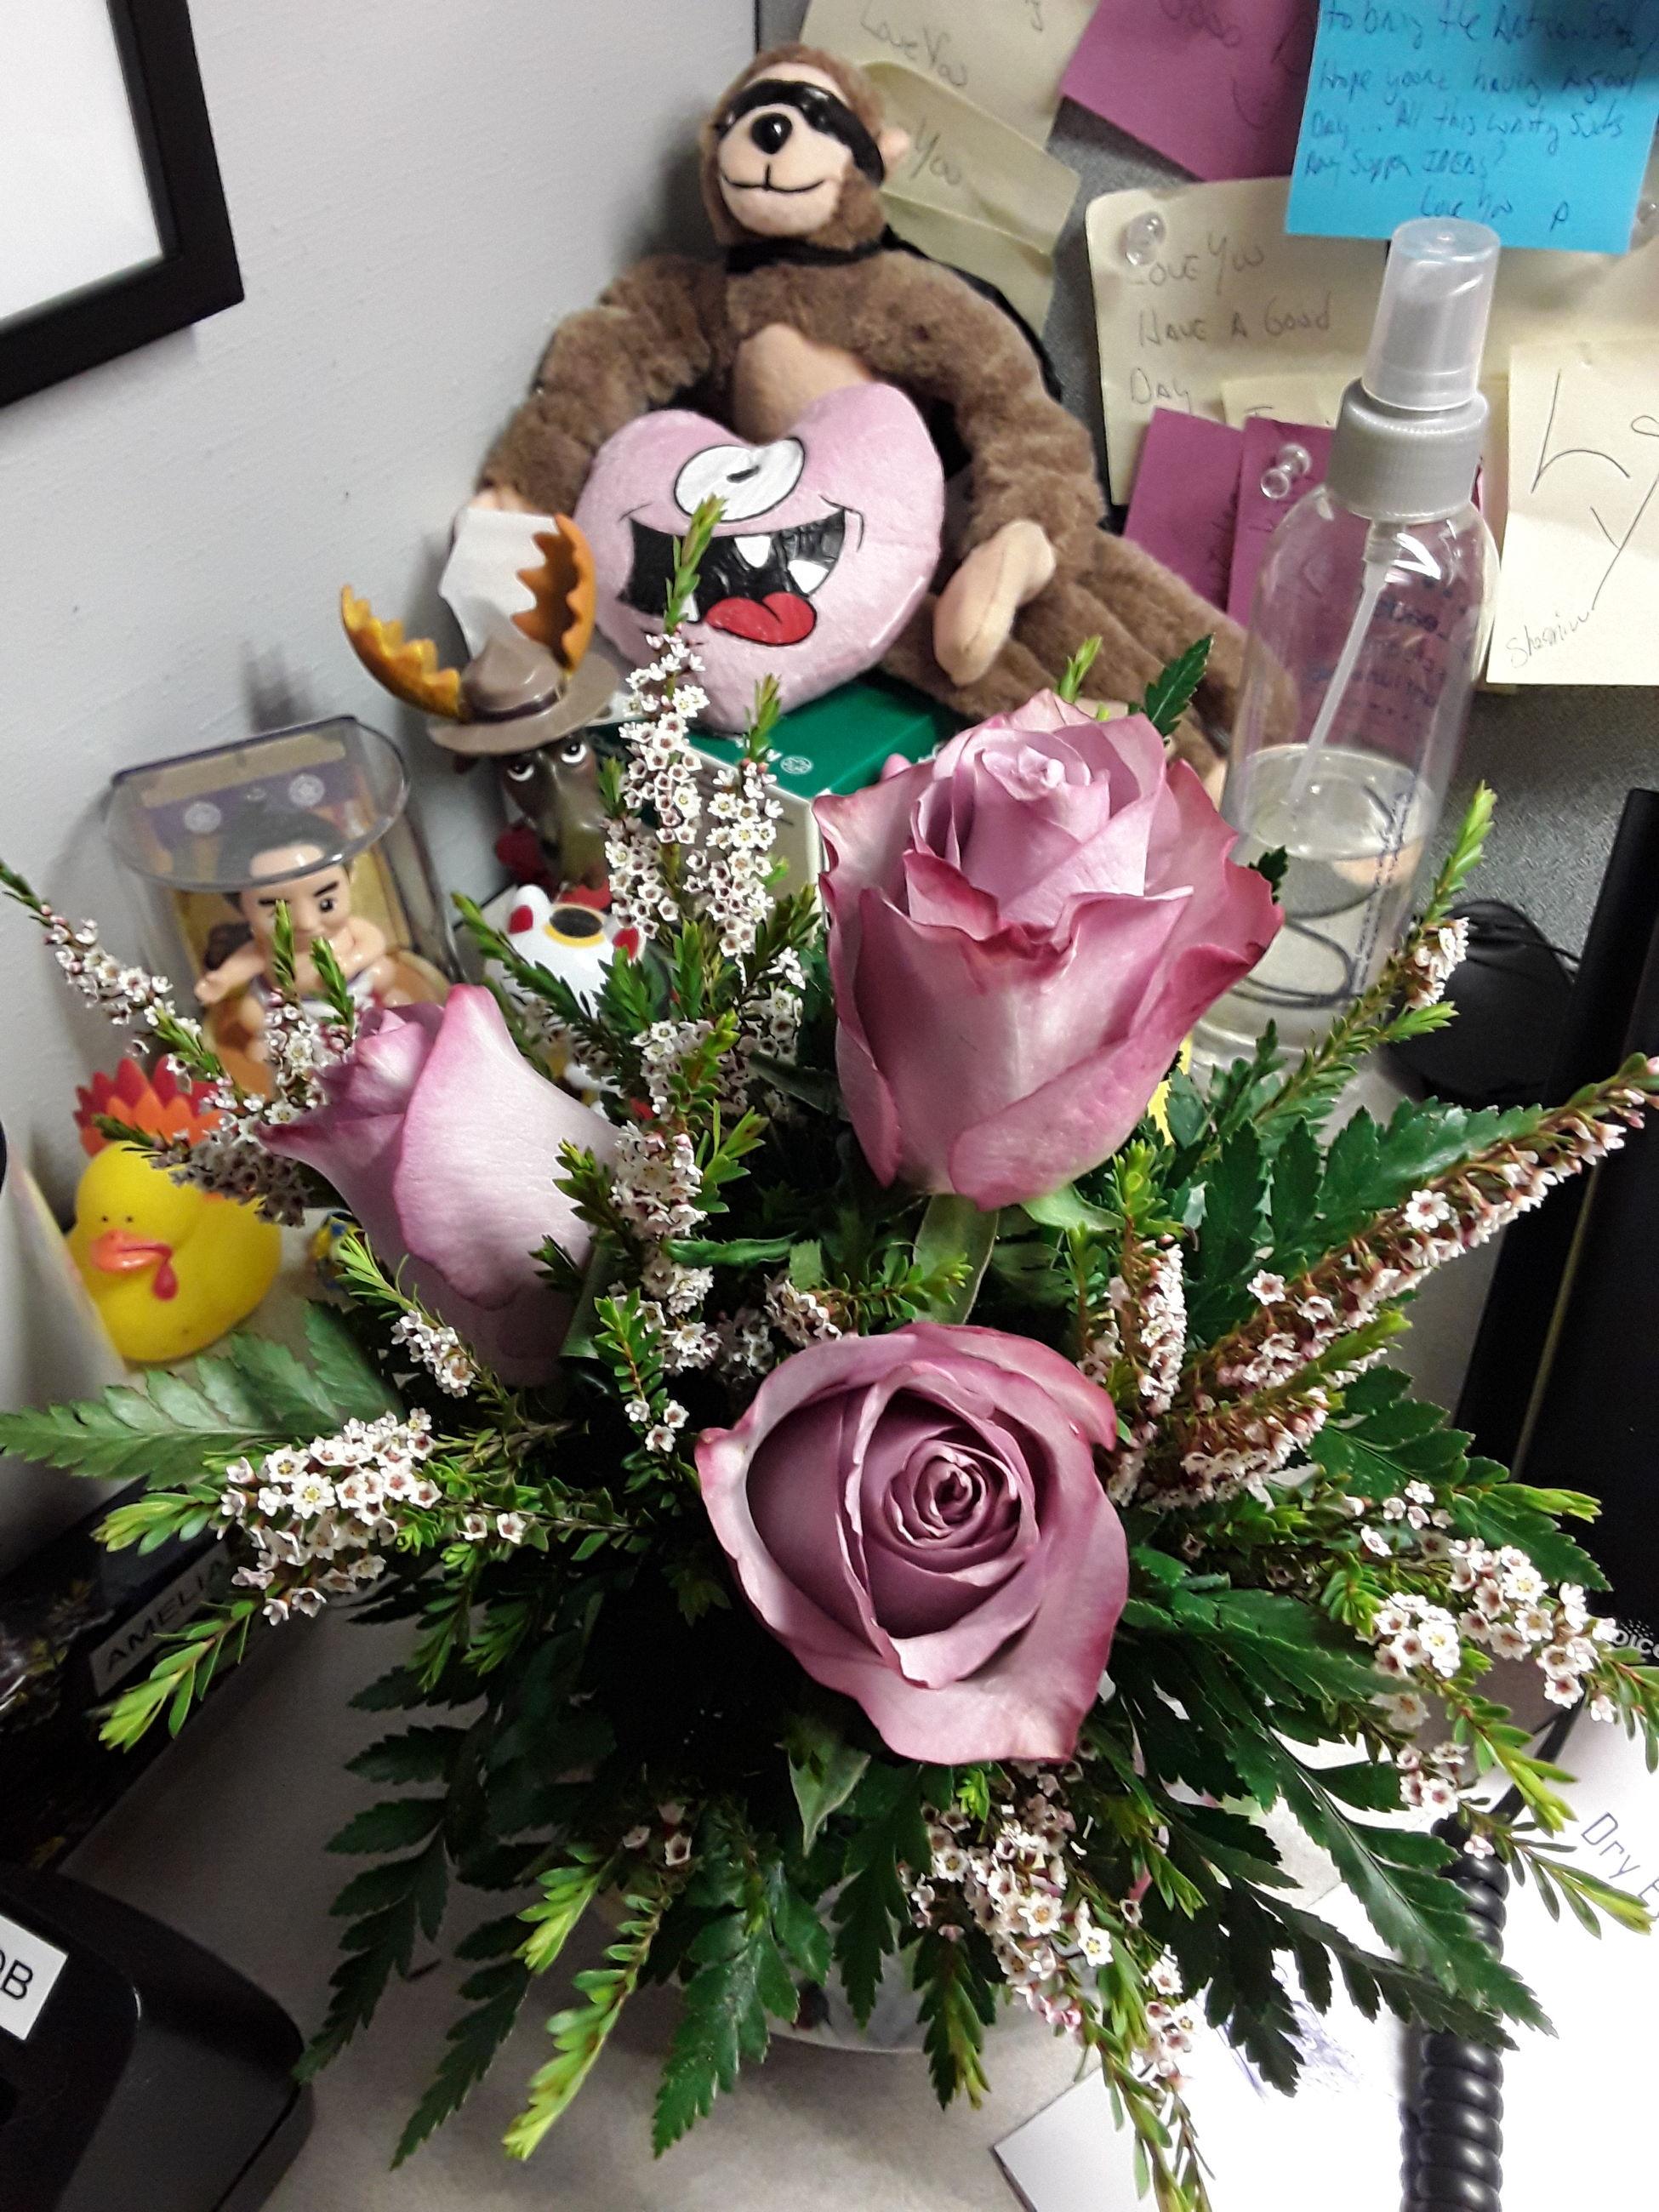 flower, archival, pink color, celebration, no people, flower arrangement, indoors, bouquet, day